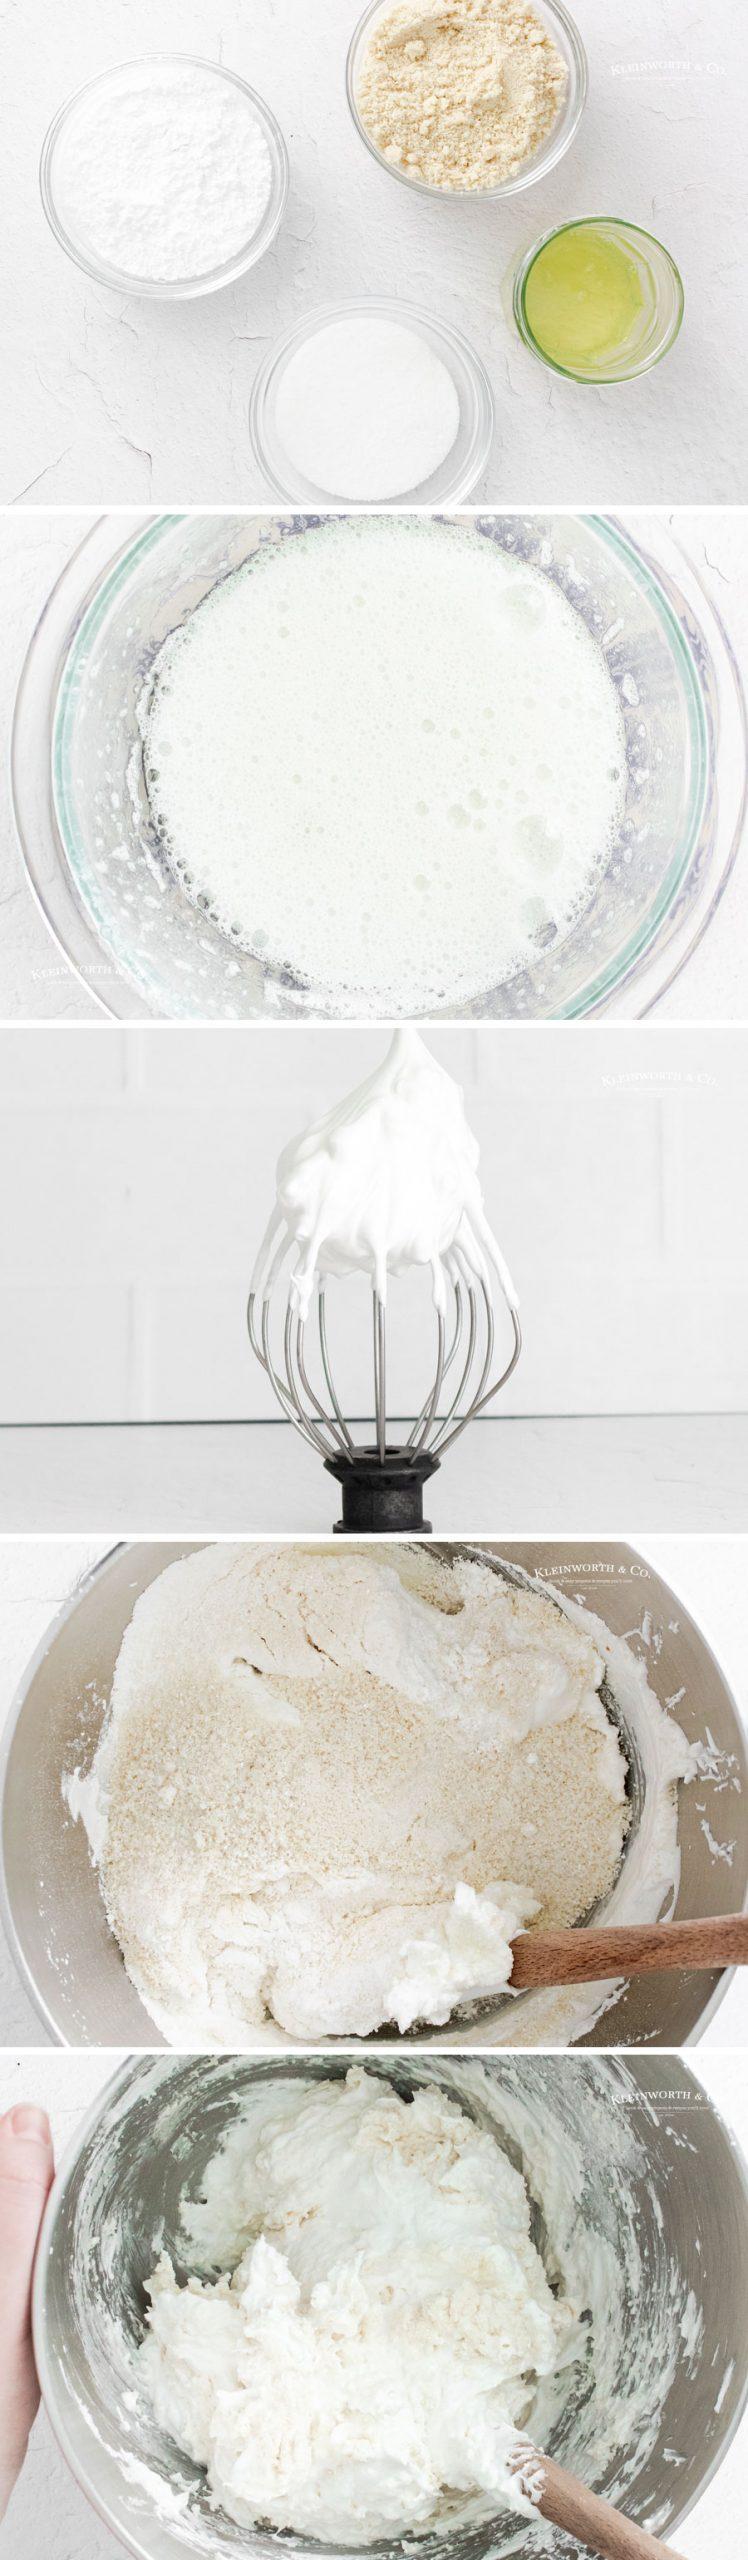 how to make Vanilla Bean Macarons 1